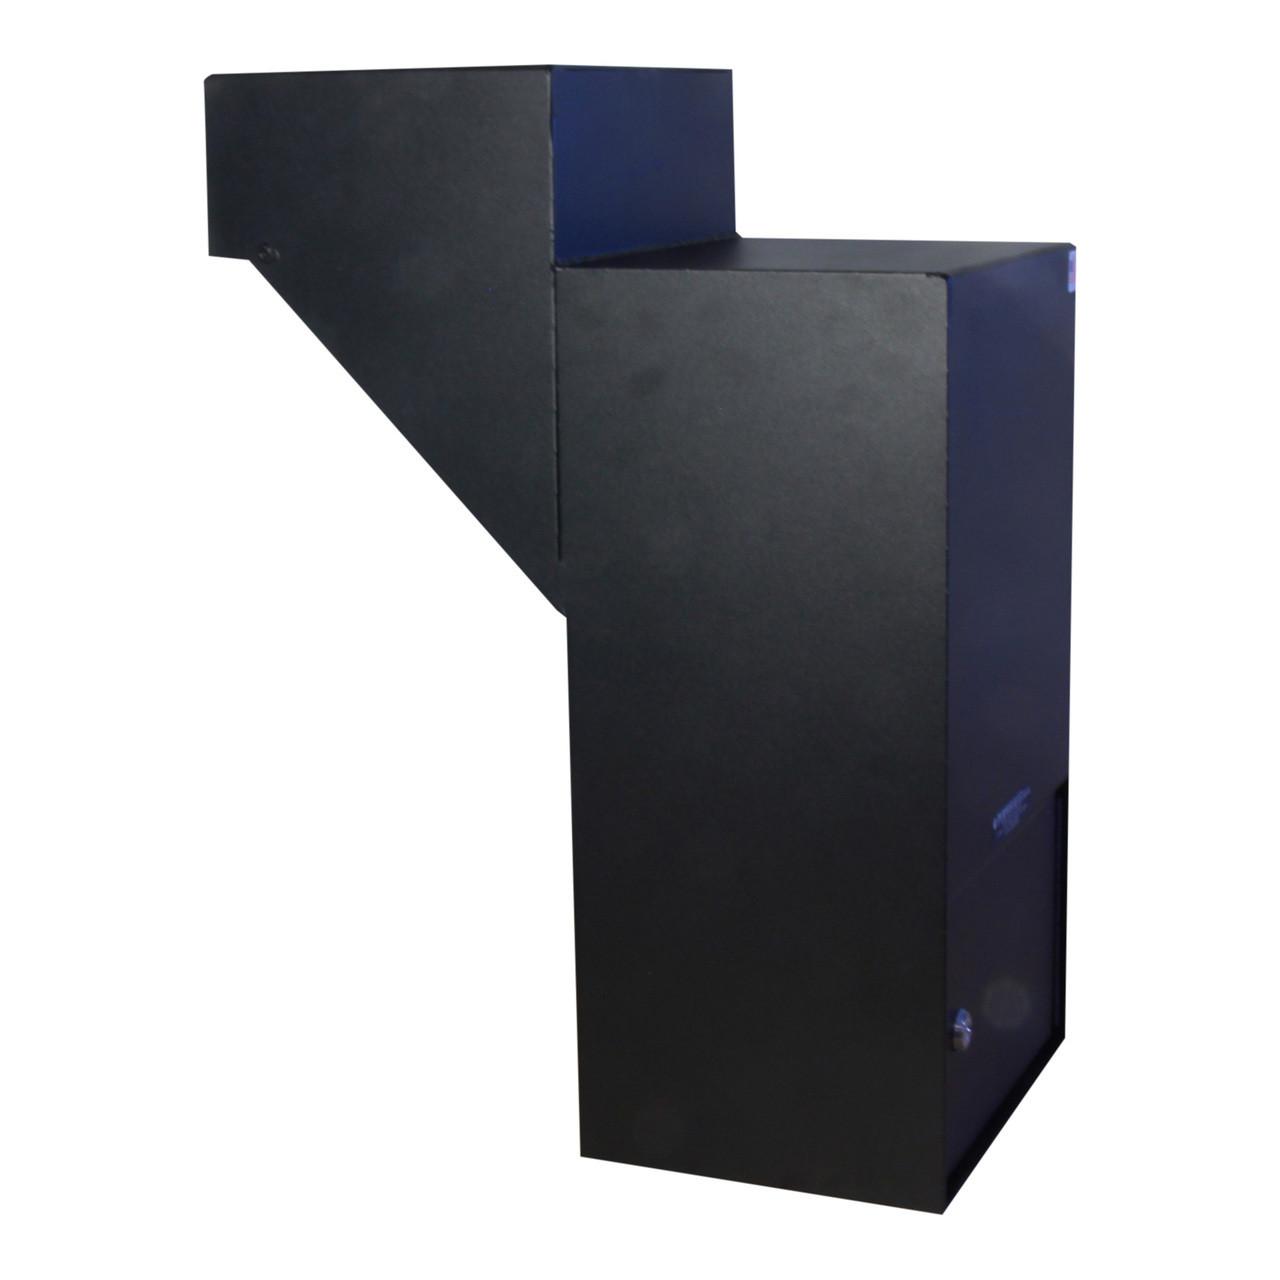 Drop Box PVNDPRO903